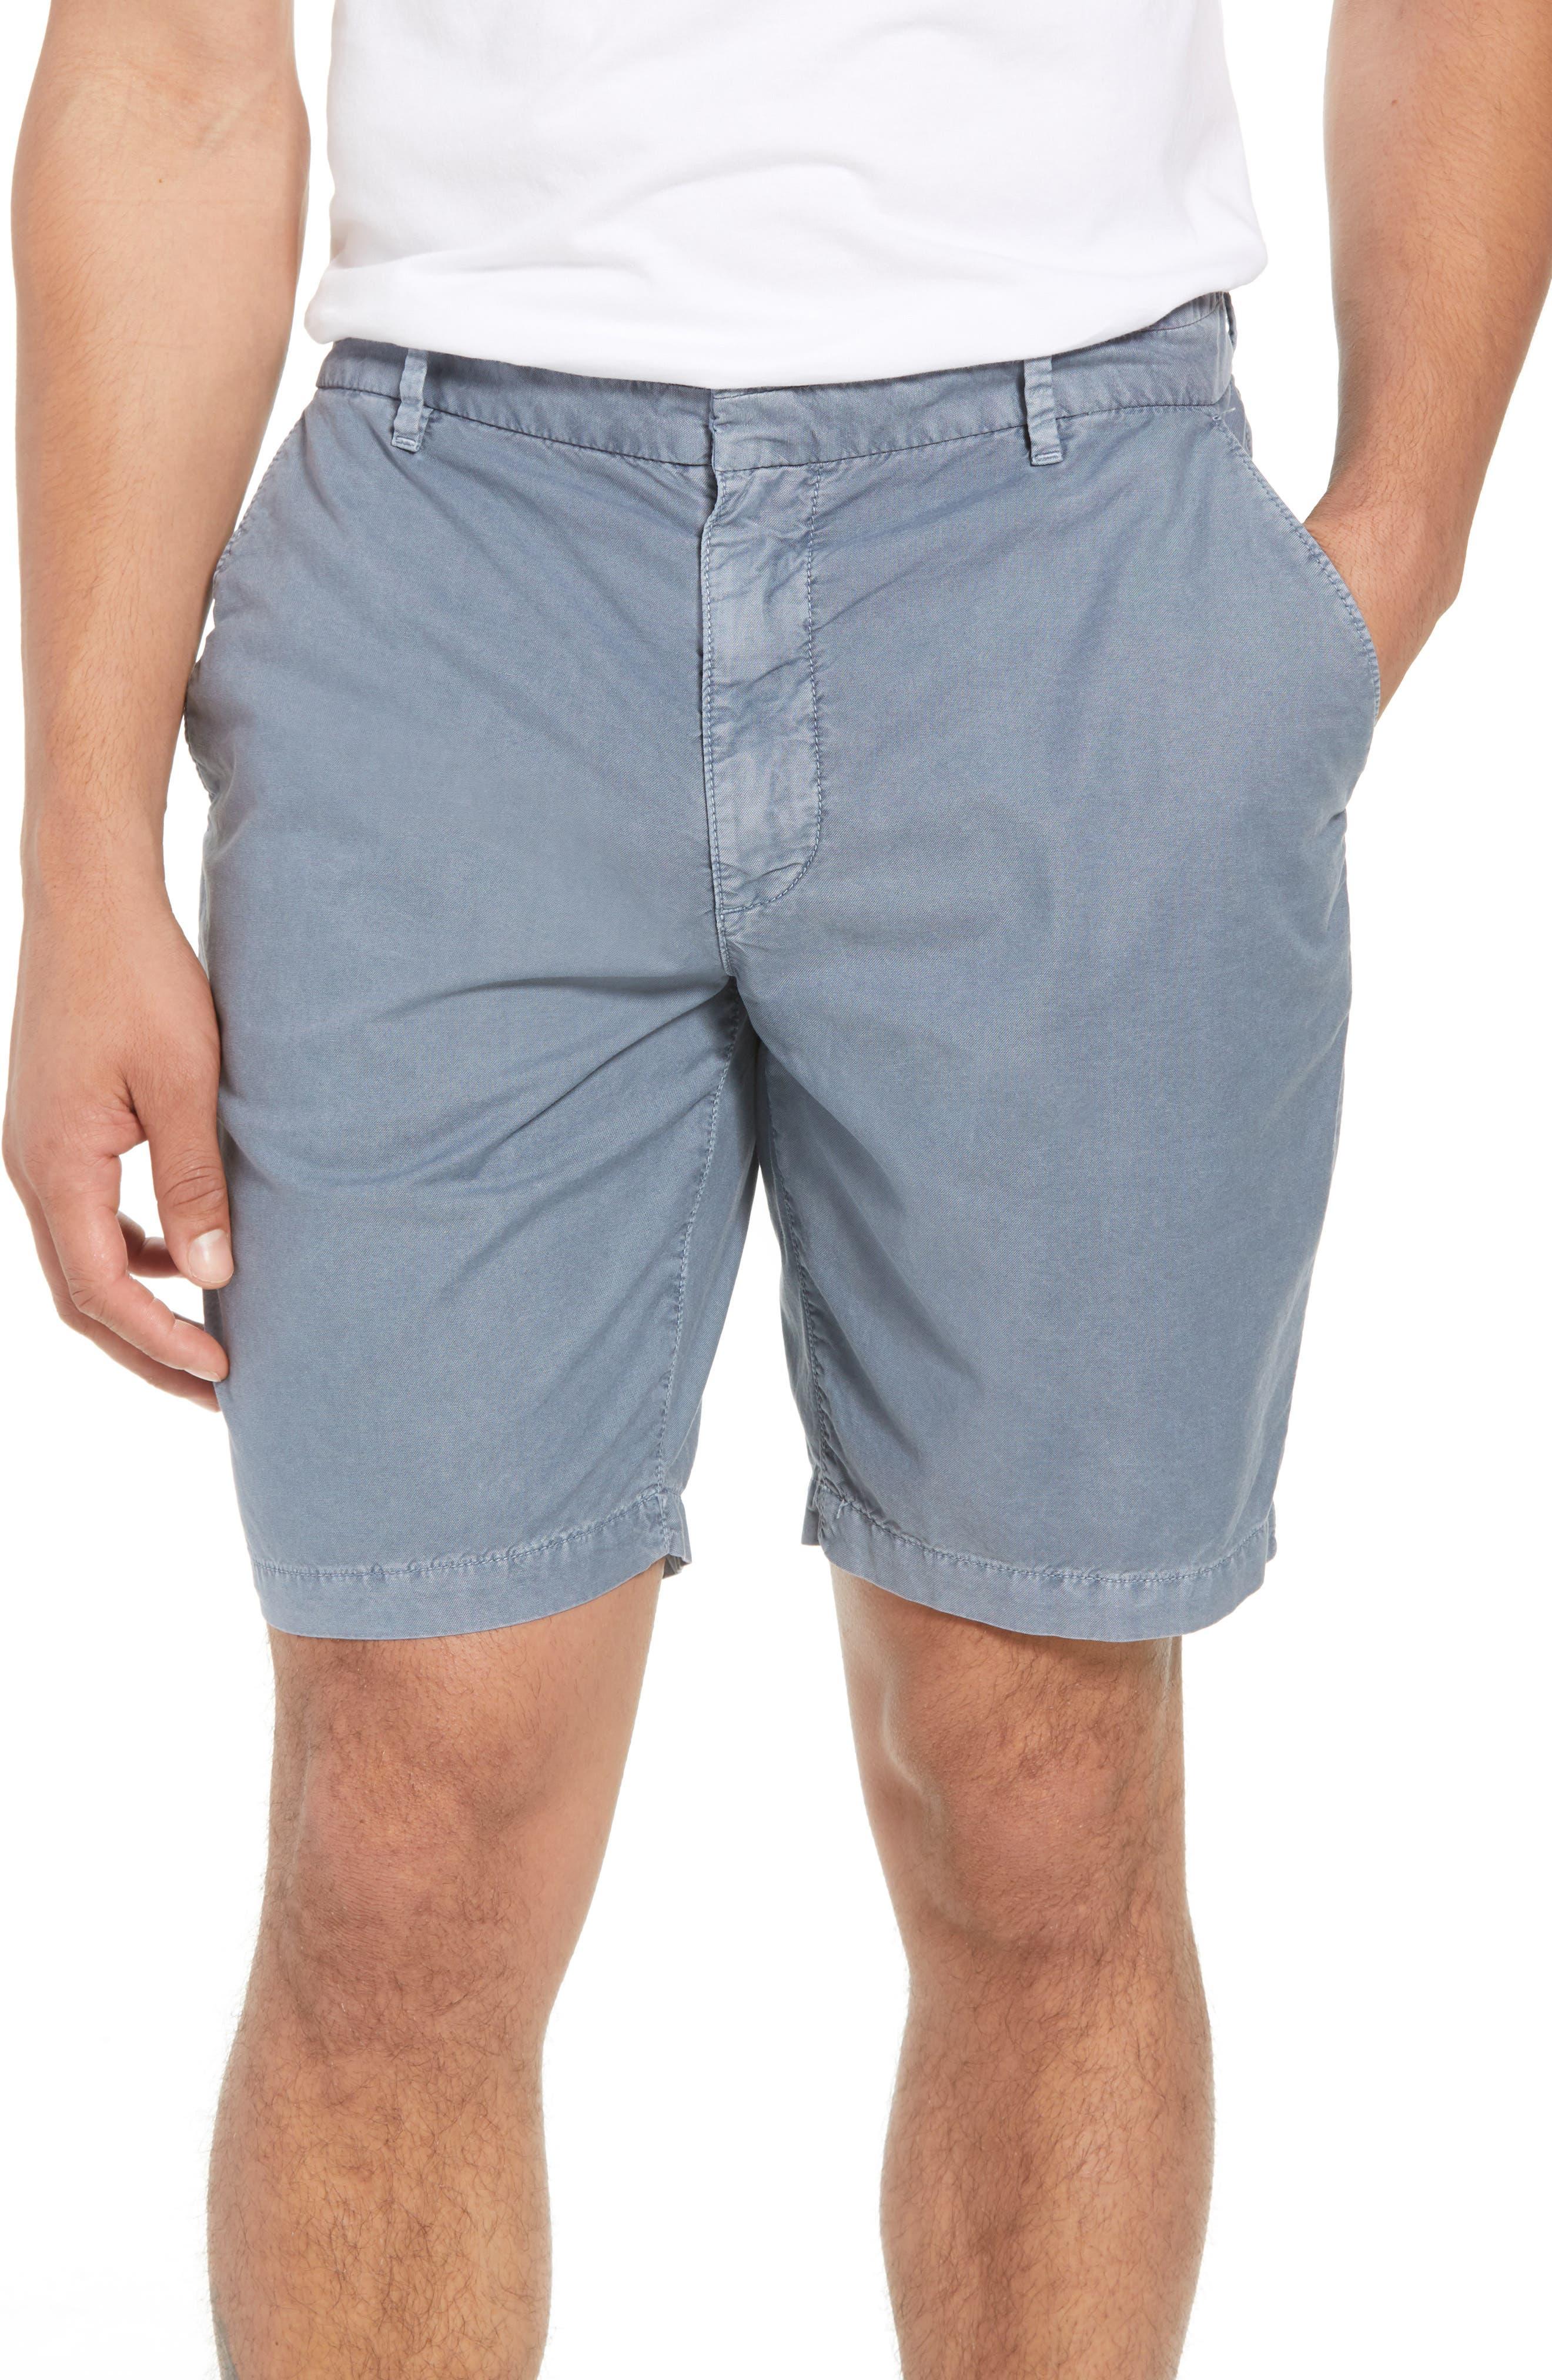 Butter Ball Shorts,                         Main,                         color, BLUE SLATE